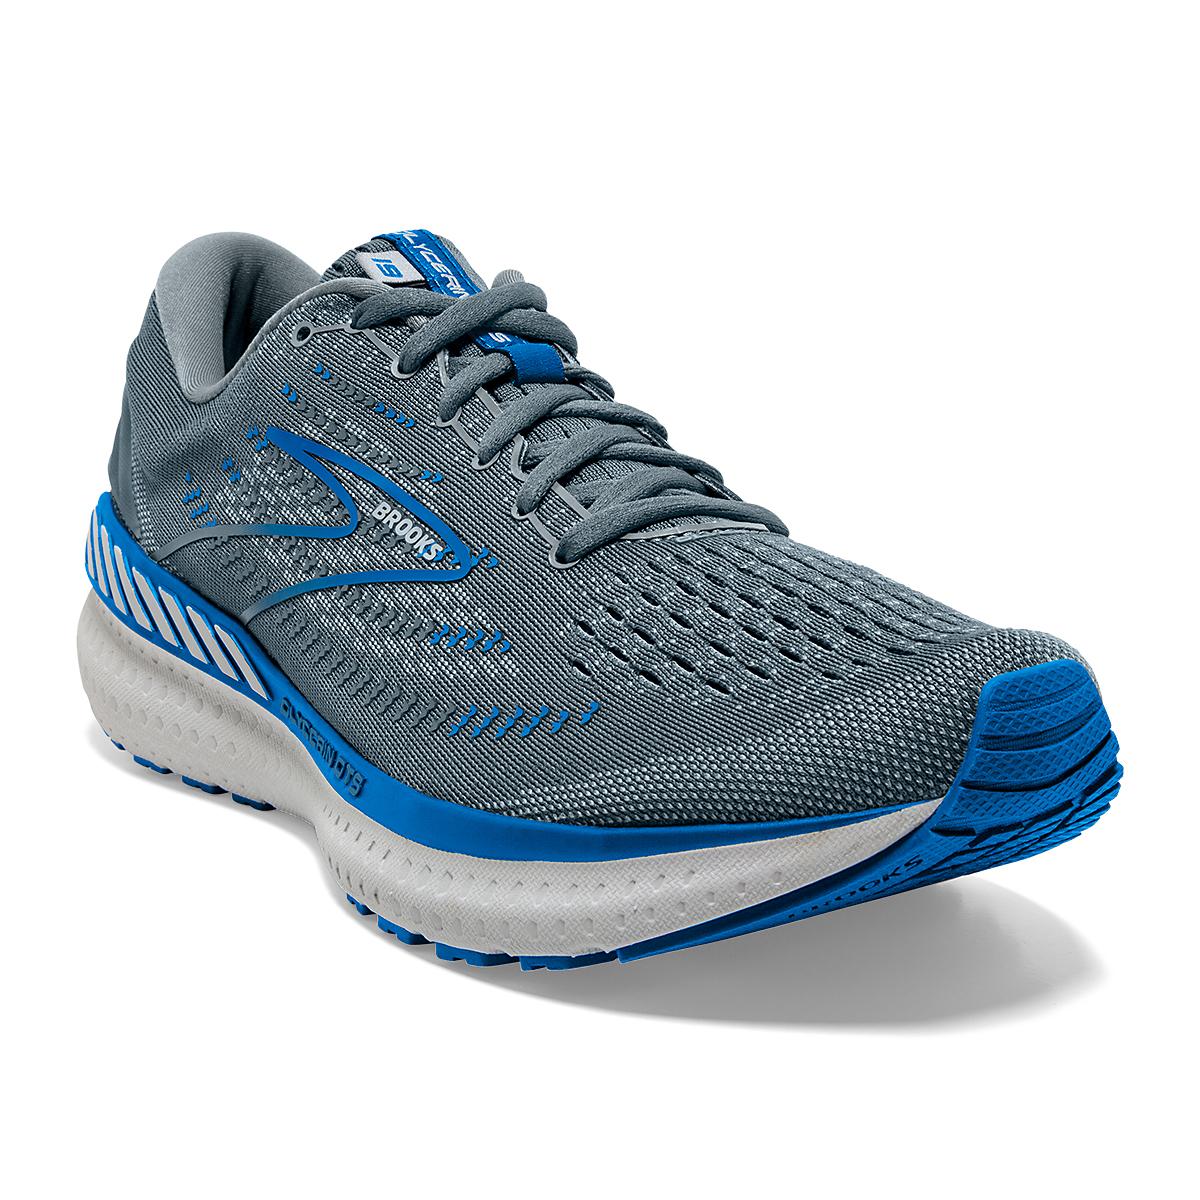 Men's Brooks Glycerin GTS 19 Running Shoe - Color: Quarry/Grey/Dark - Size: 7 - Width: Wide, Quarry/Grey/Dark, large, image 4